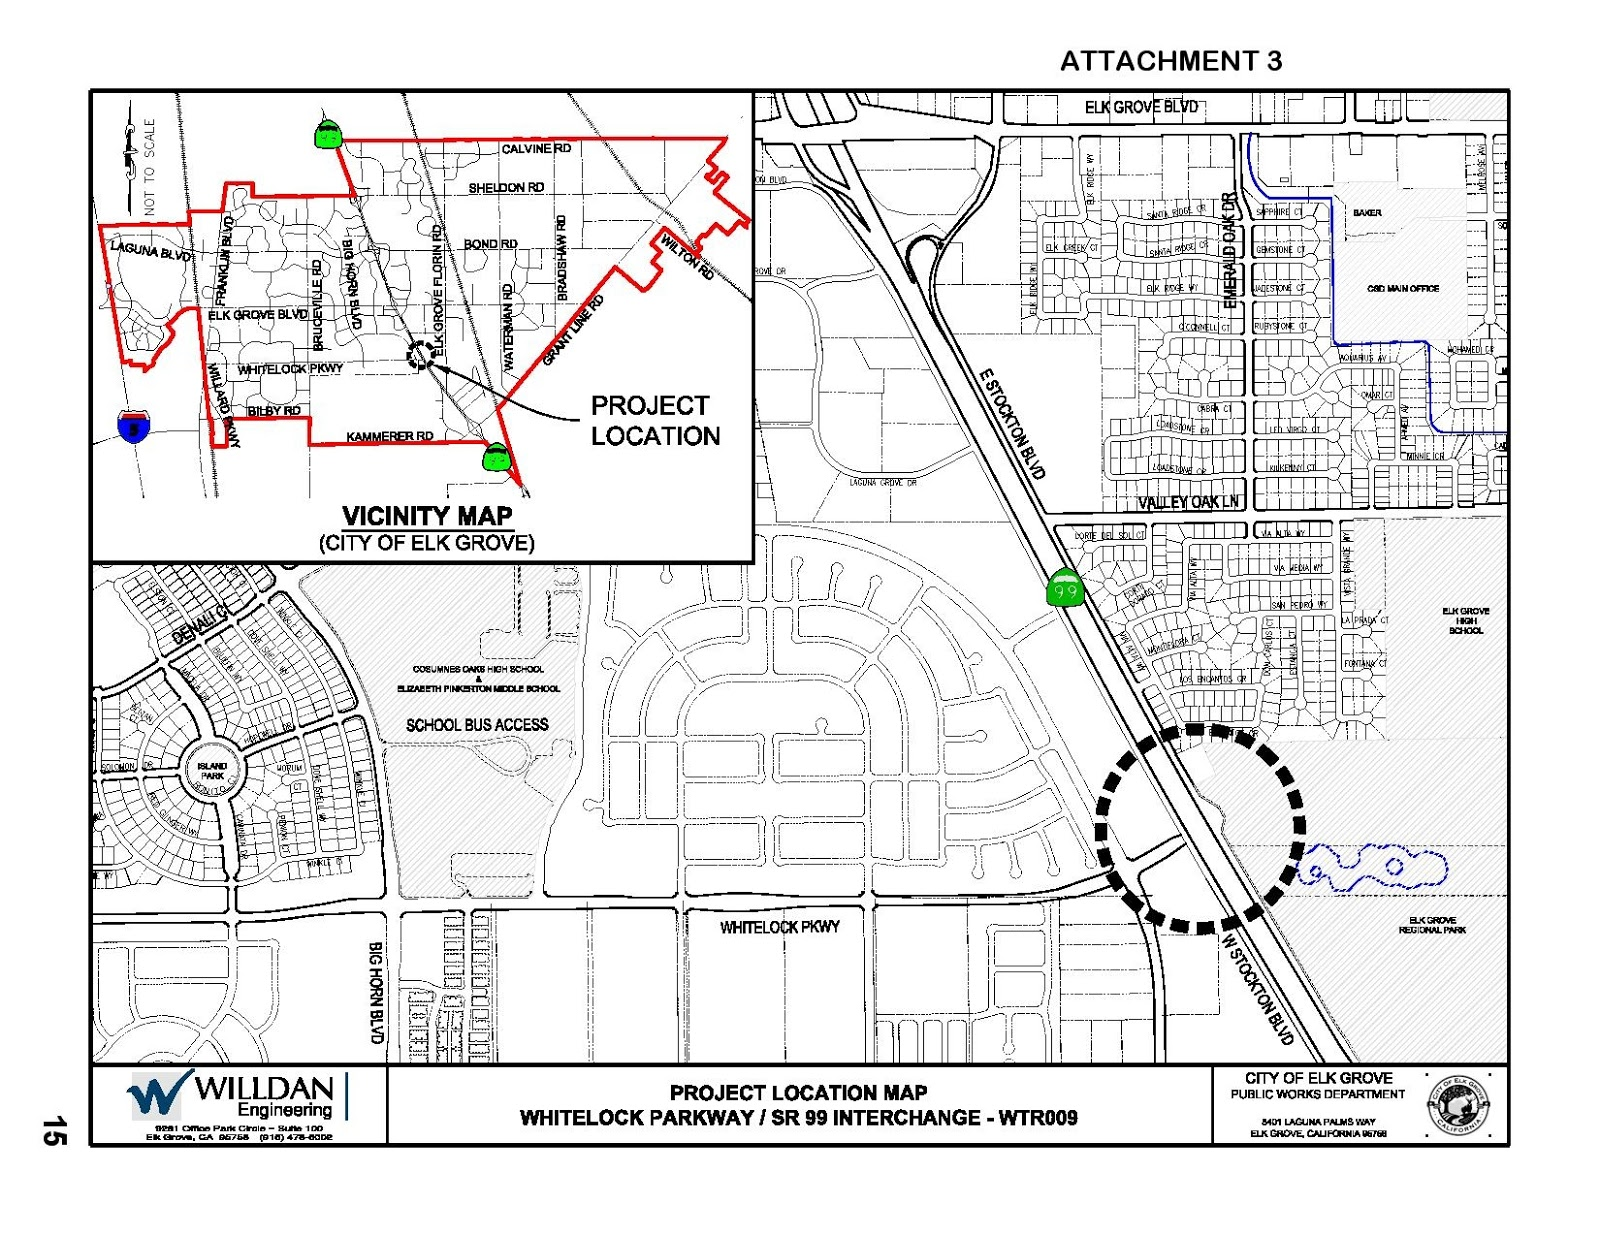 Elk Grove Trails Committee to Report on Proposed Whitelock Pkwy. Interchange Stakeholders Meetings